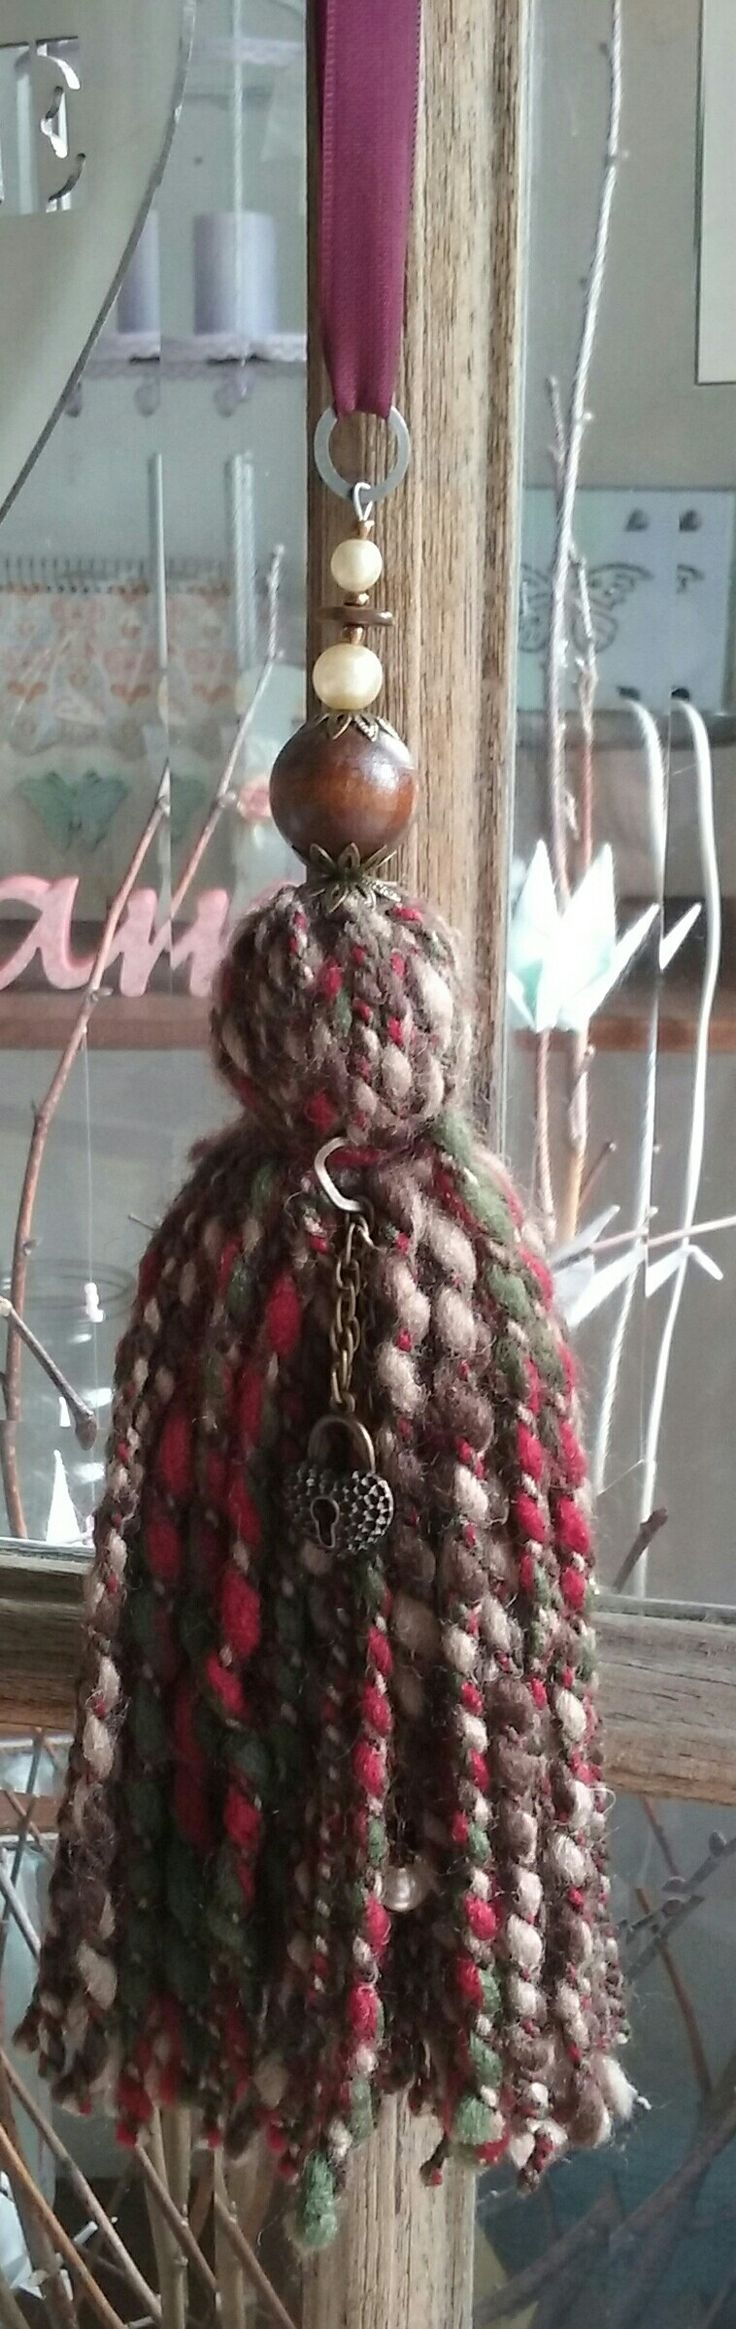 Borla de lana en tonos bordeaux con dijes colgante. Sujeta cortina o puertero